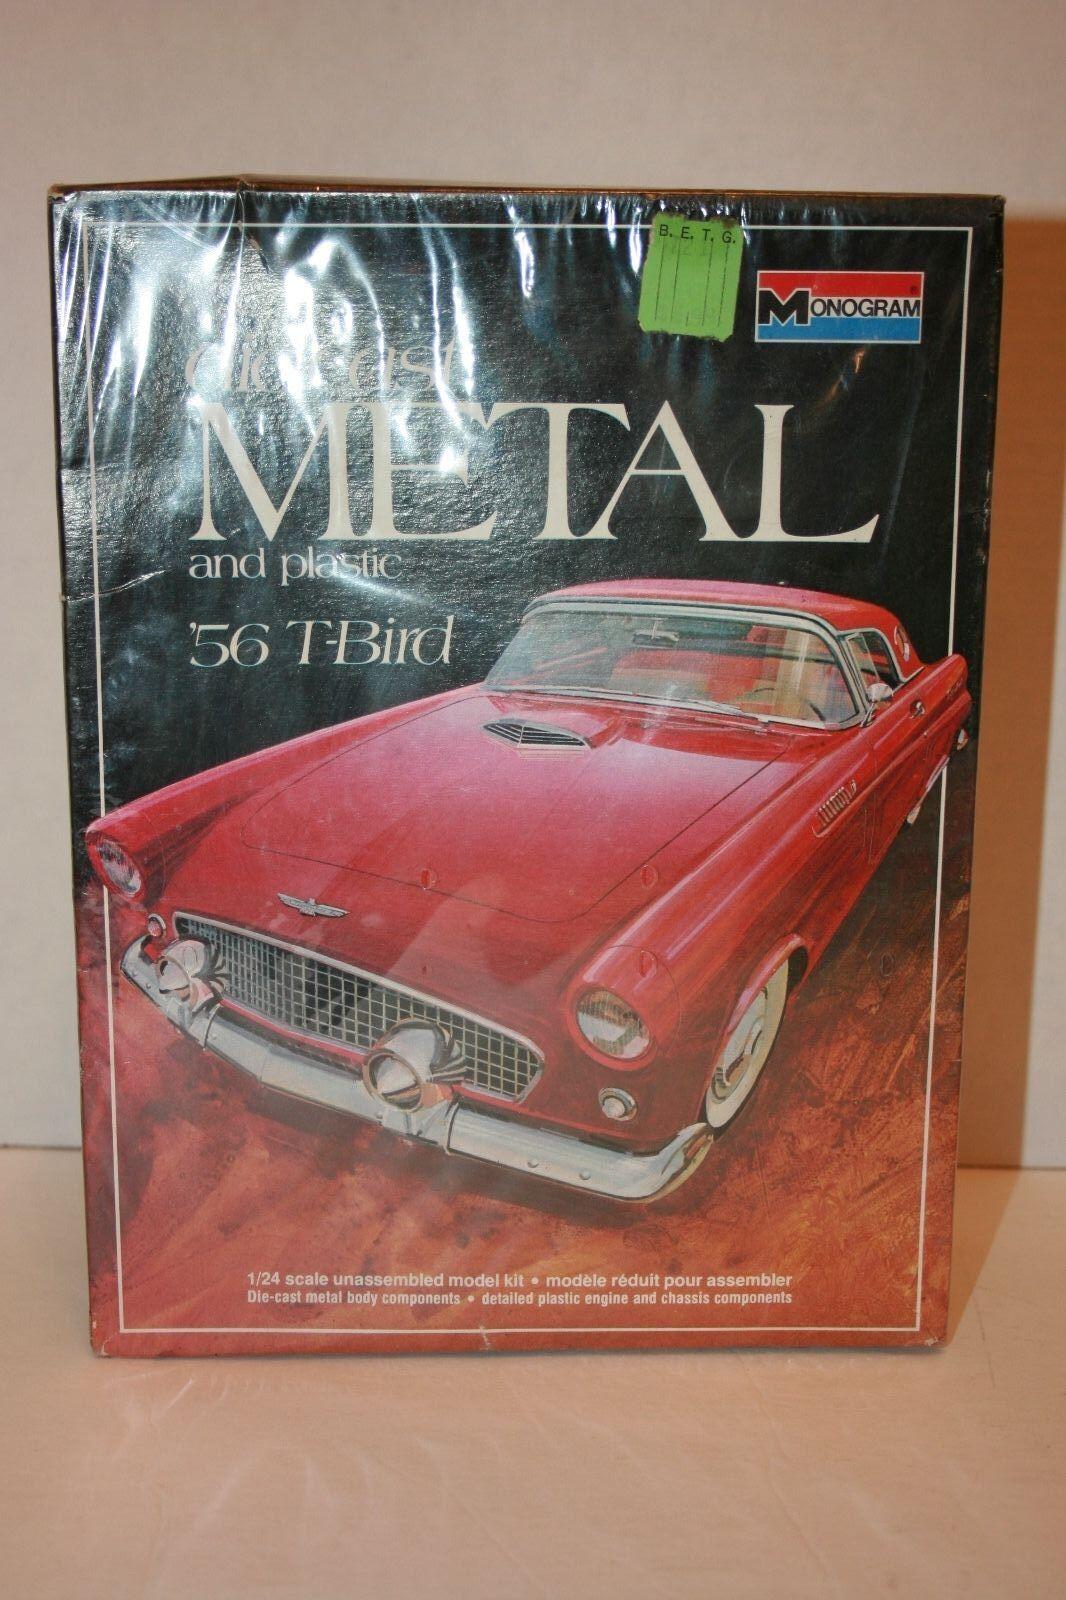 Monogram Die-Cast Metal and Plastic 56' T-Bird 1 24 scale model kit Sealed